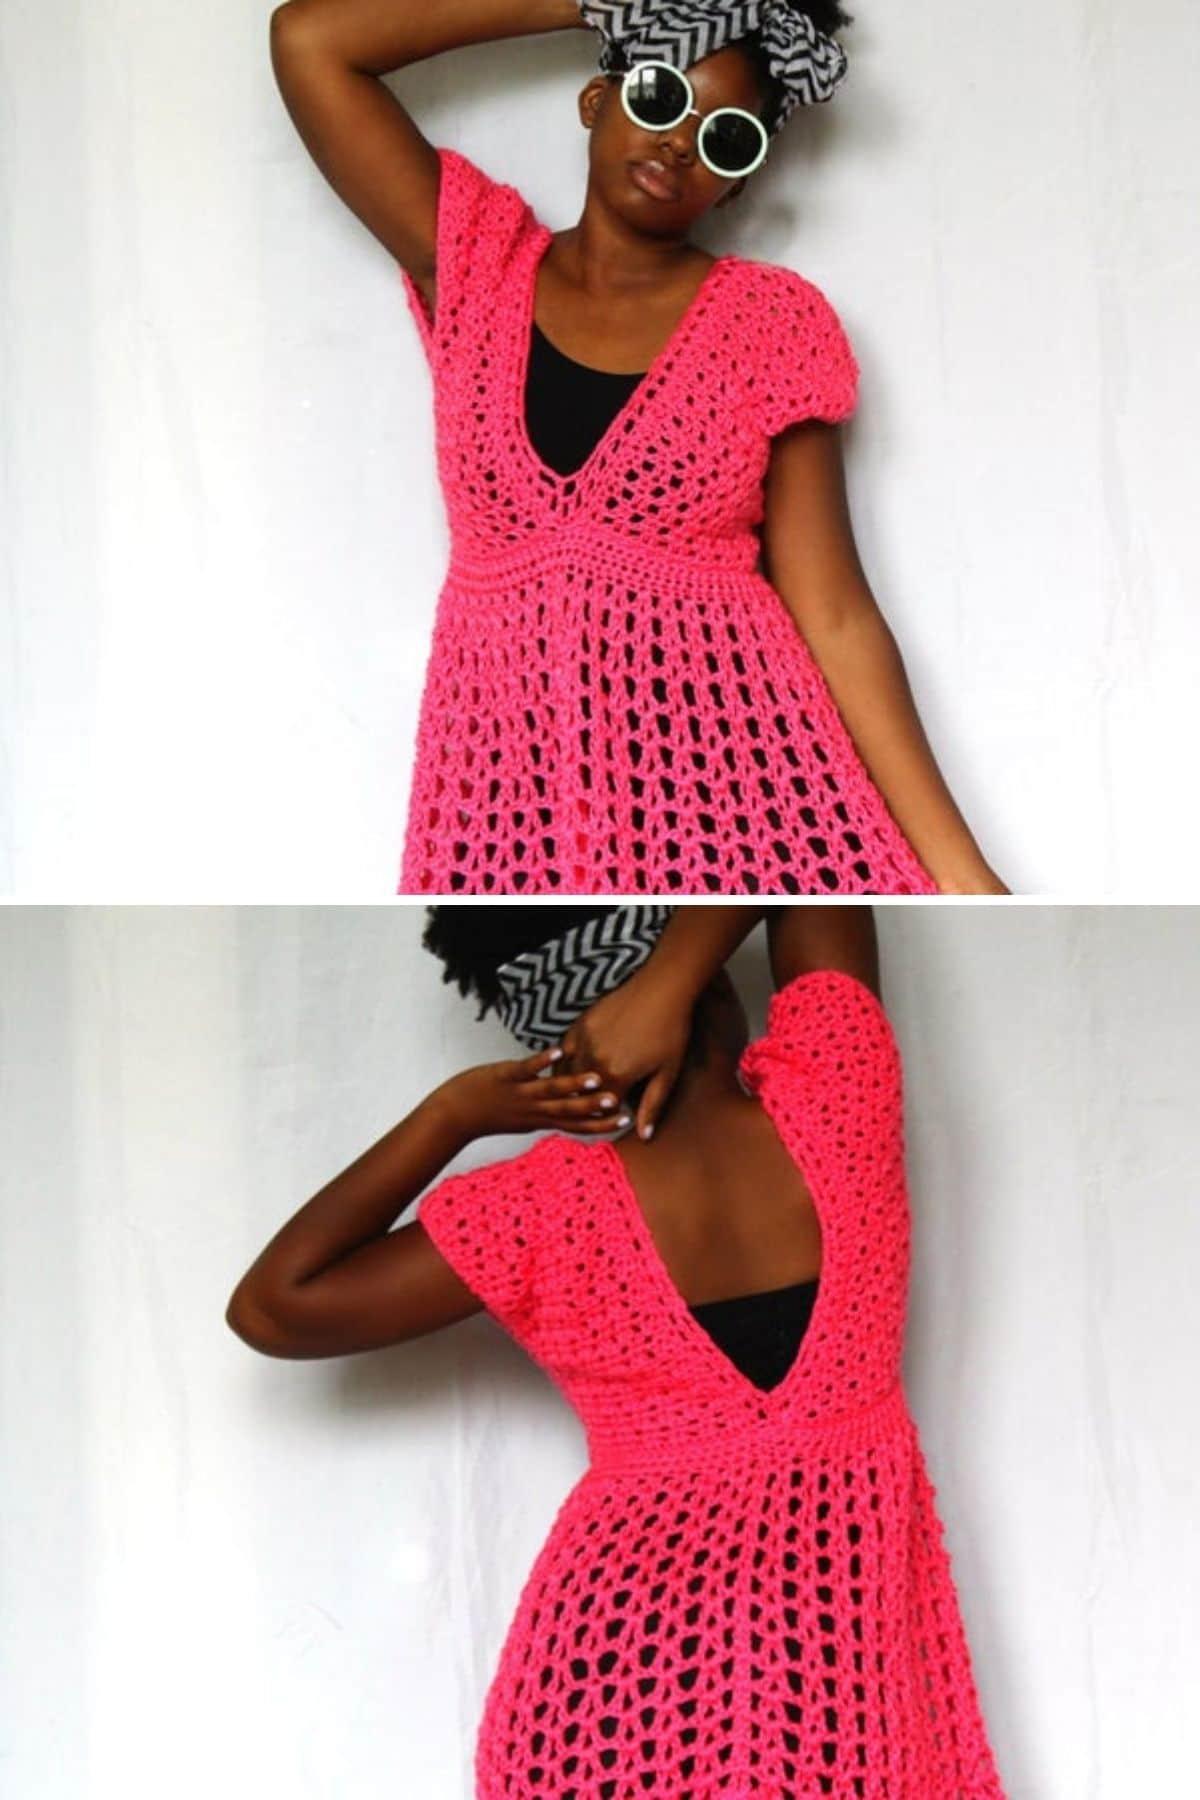 Black woman in bright pink dress